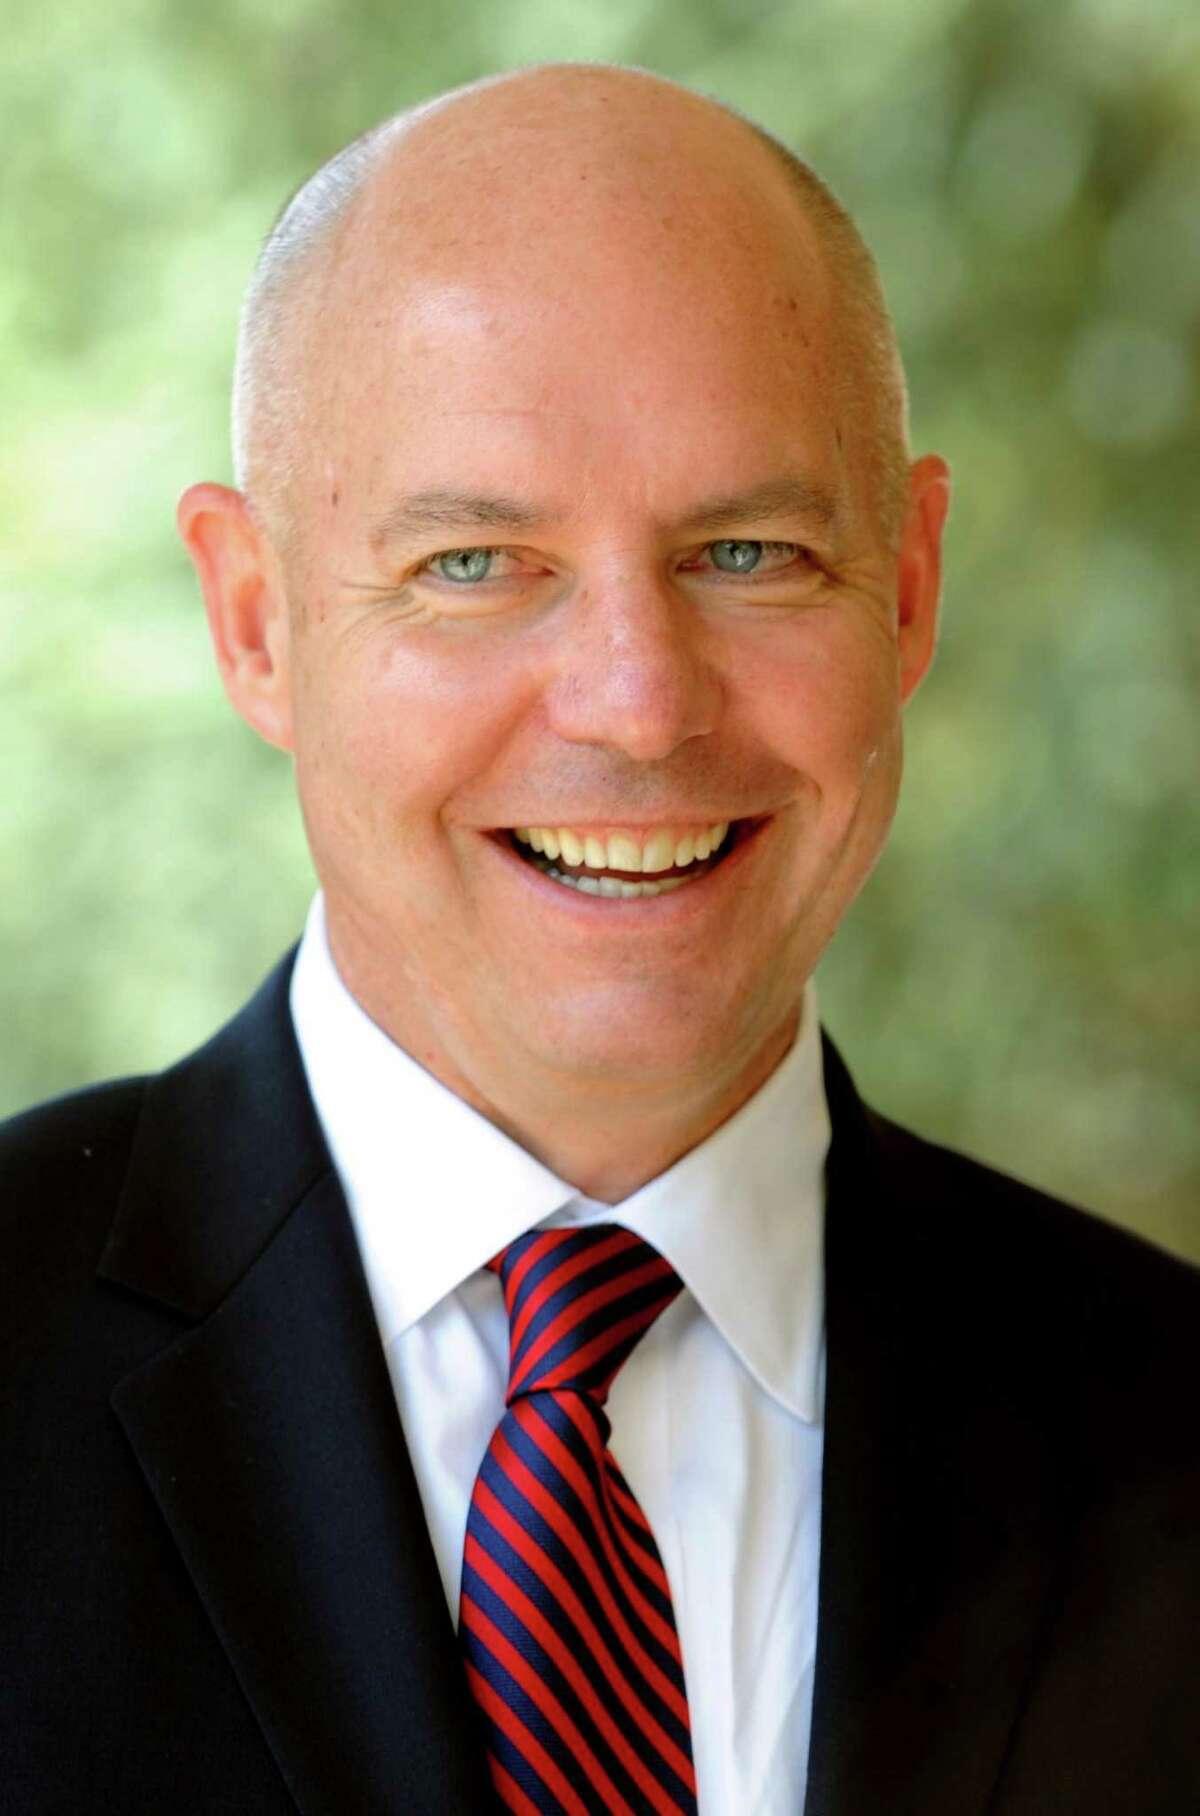 Connecticut Under Secretary for Criminal Justice Mike Lawlor